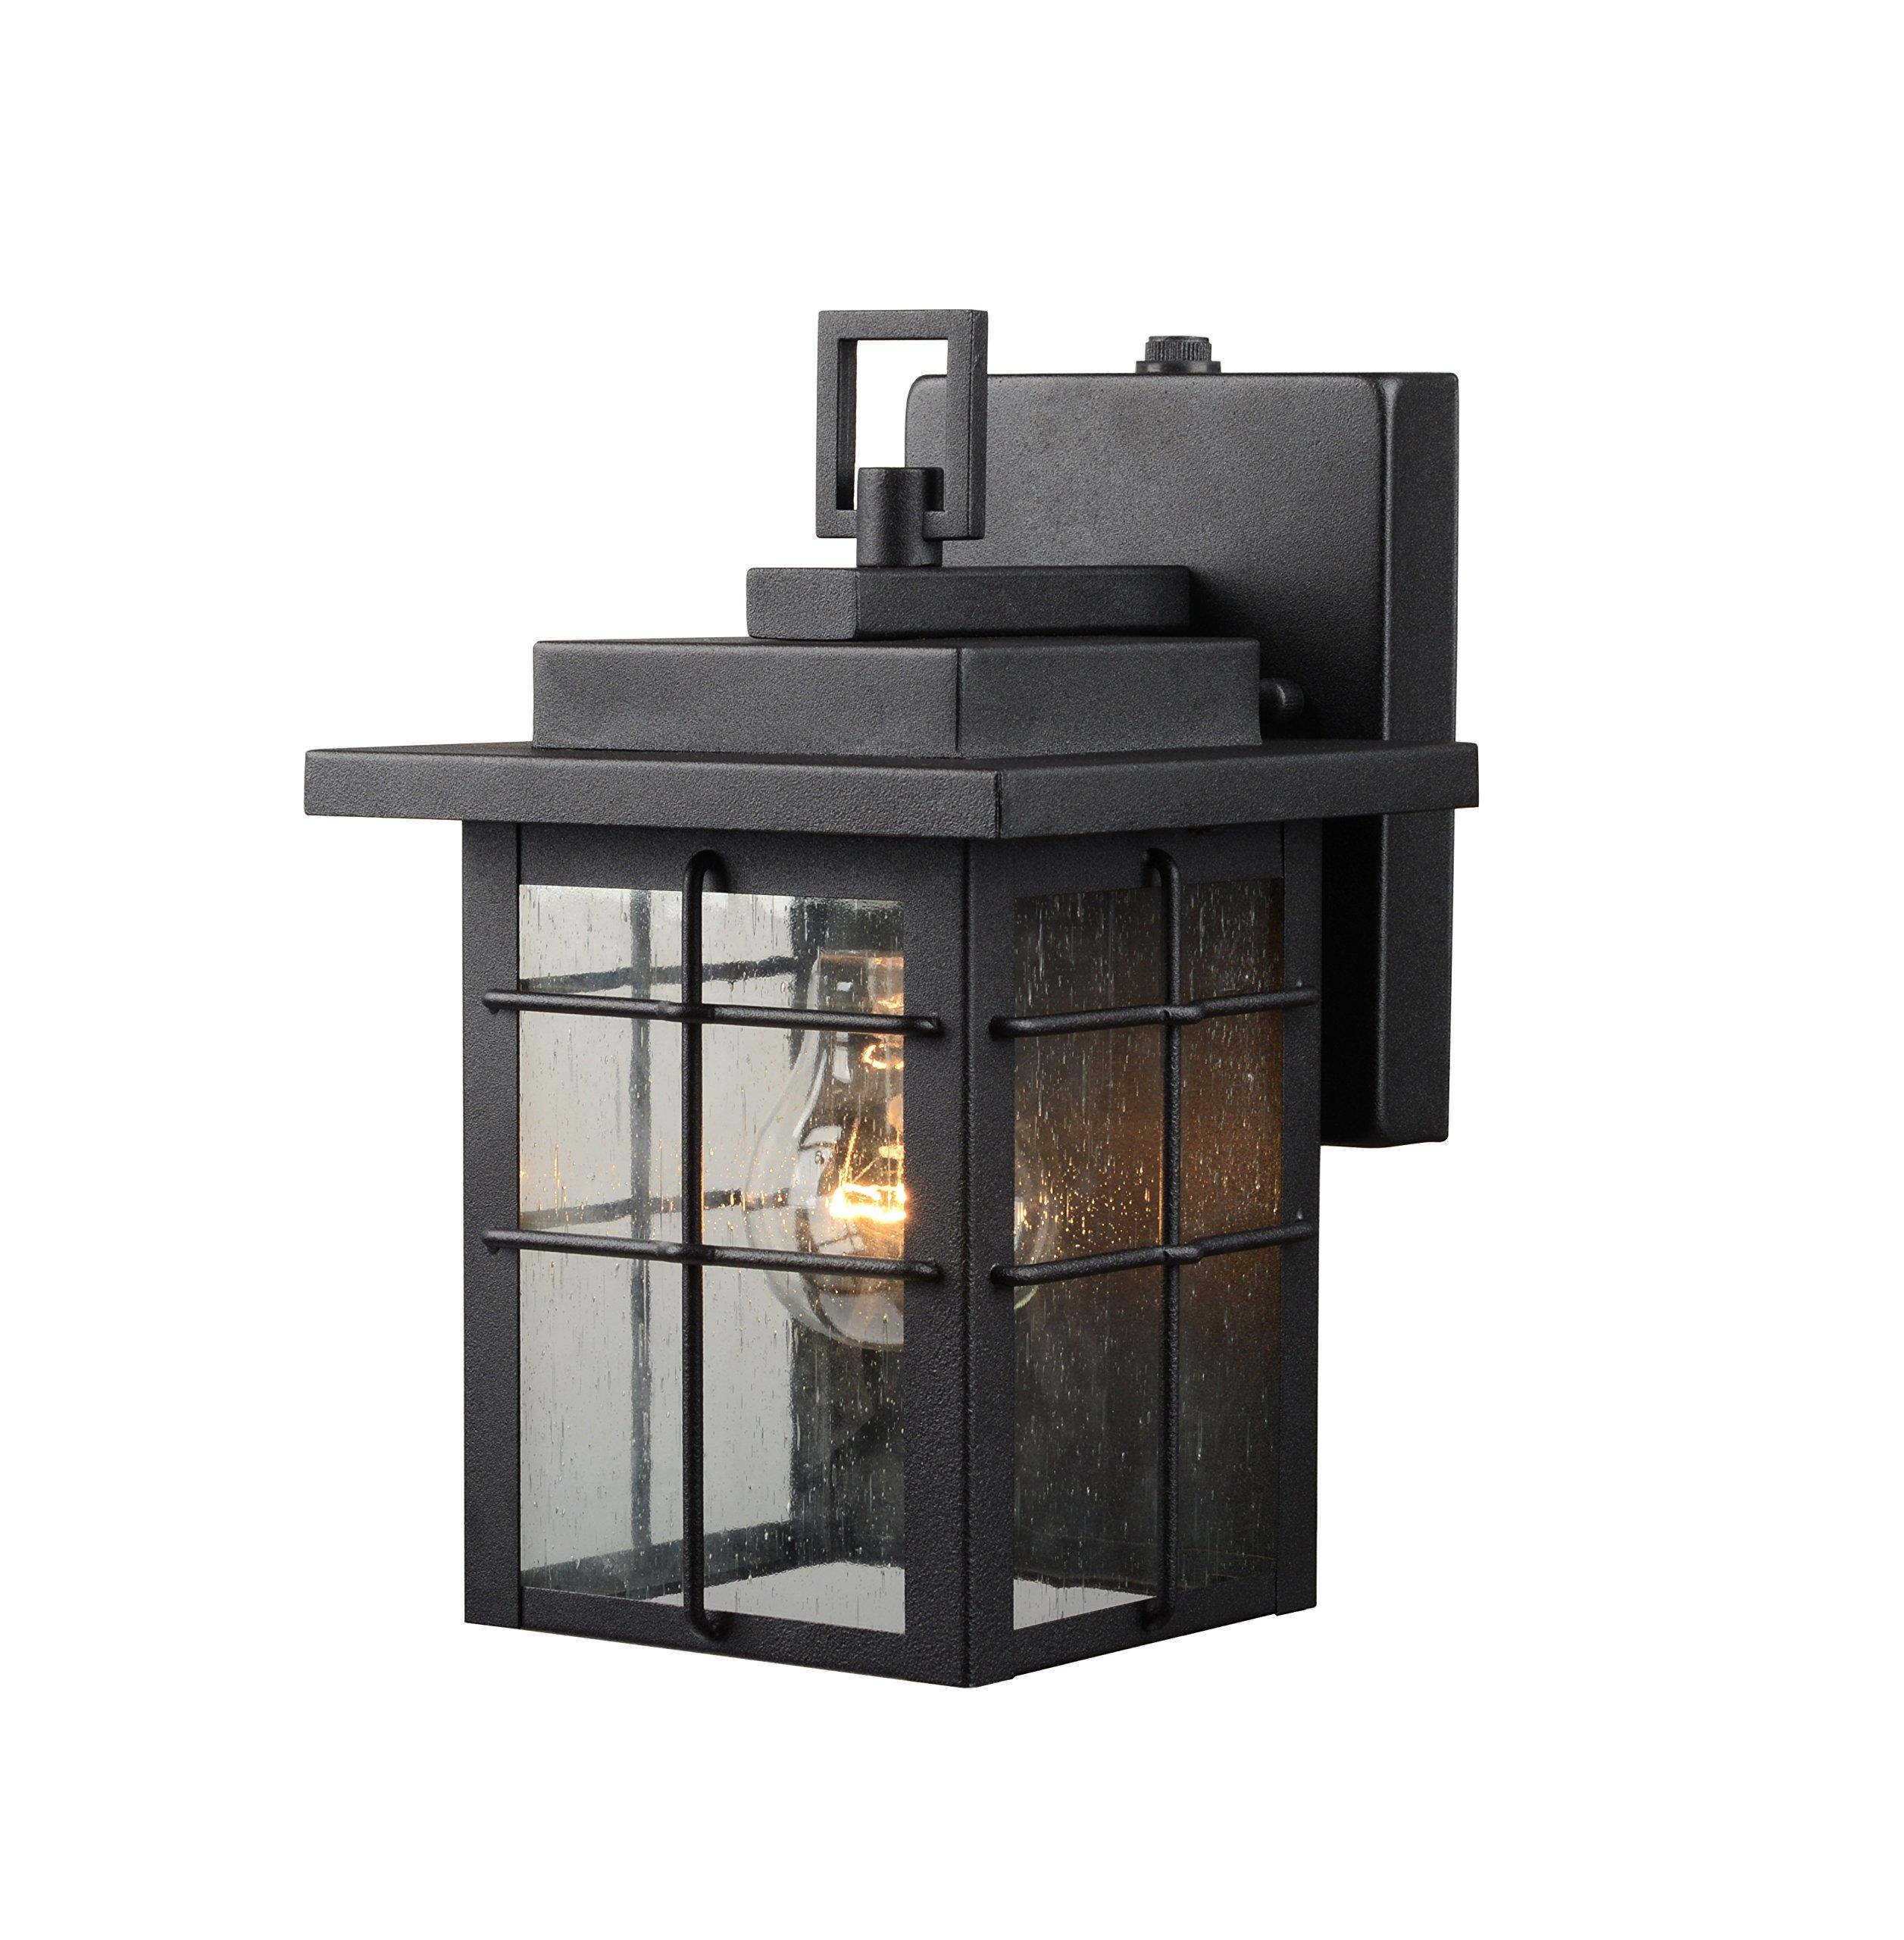 Hardware House 21-2359 Square Lantern w/Photo Cell, Black Finish - One Light by Hardware House